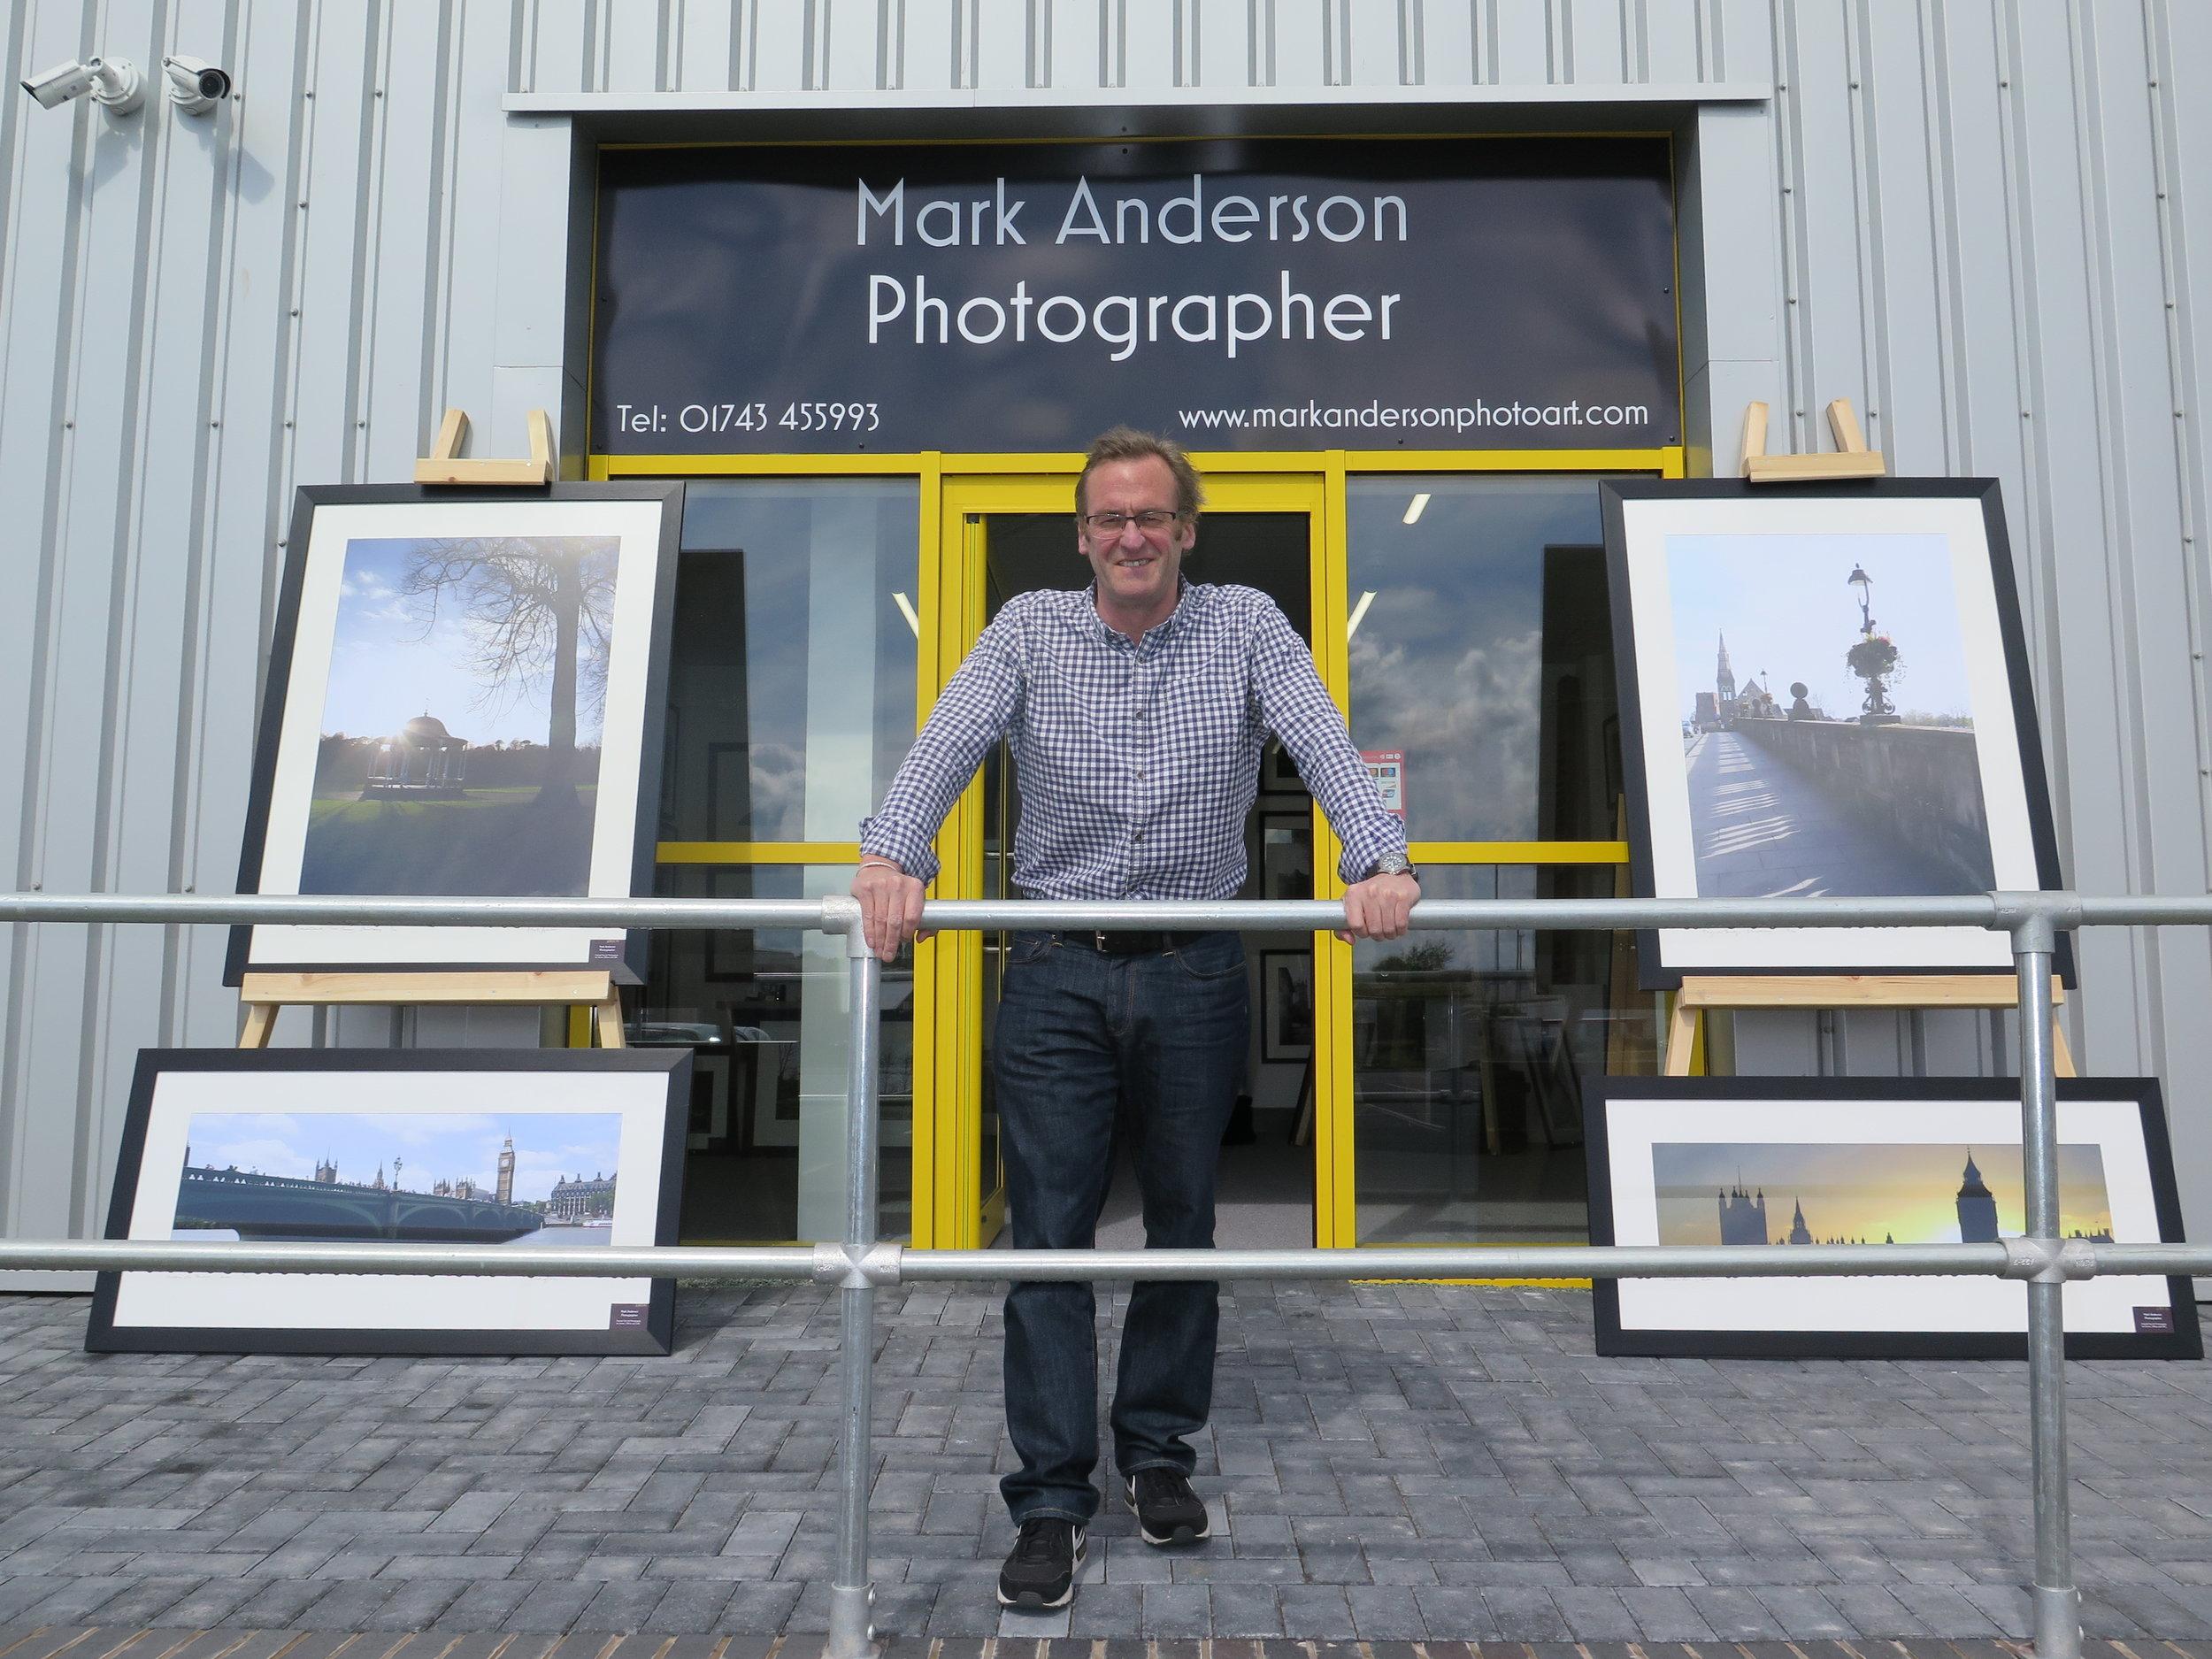 Mark Anderson outside the new studio.